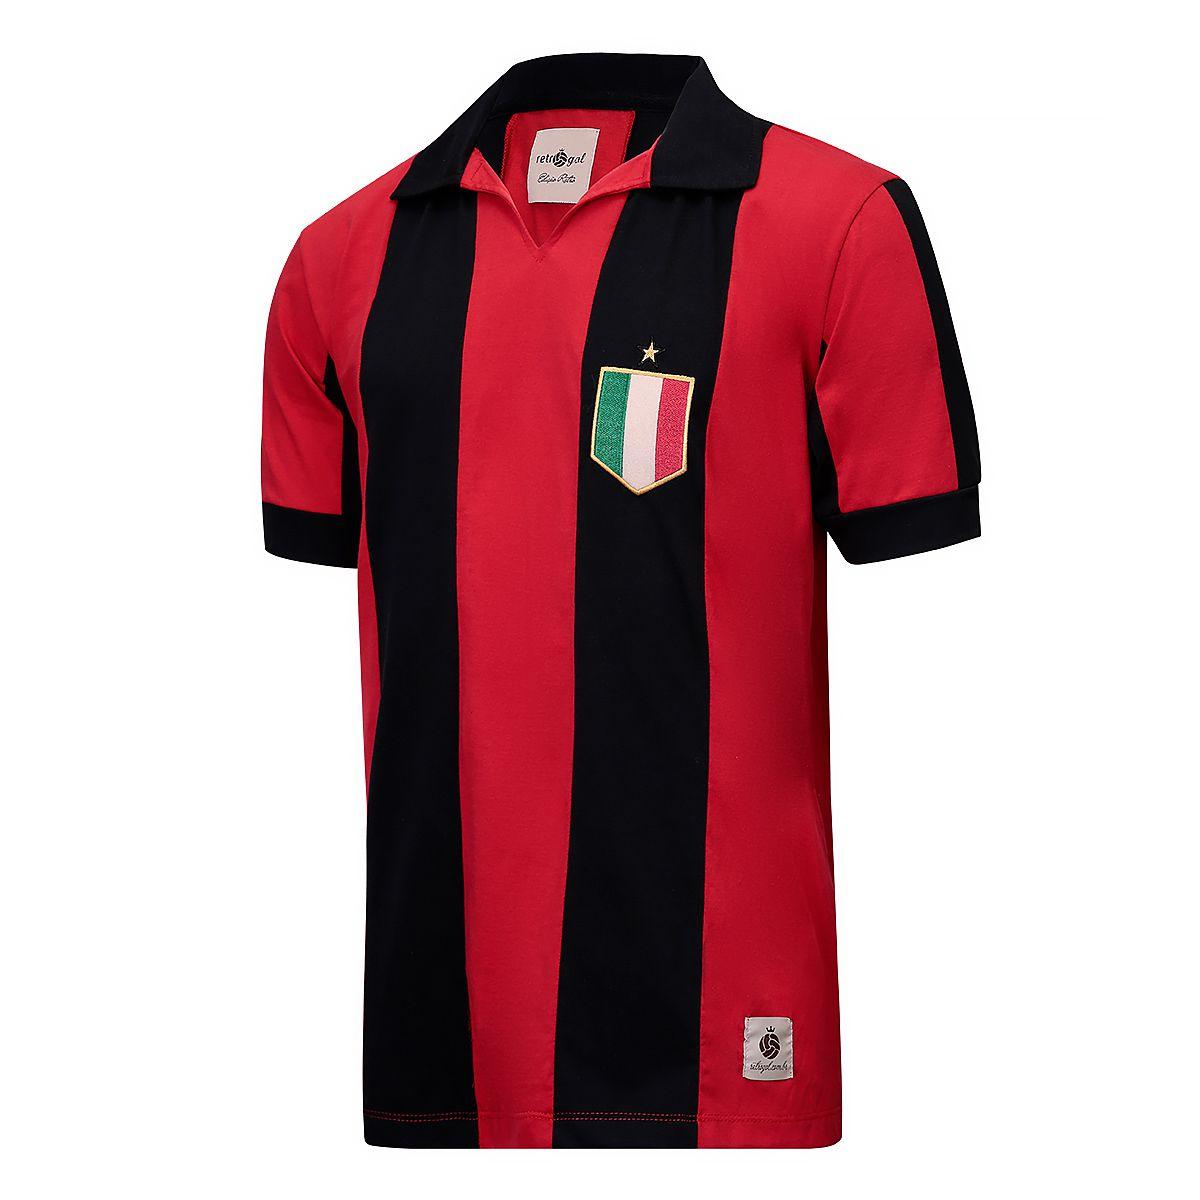 Camisa Milan Retrô Anos 80